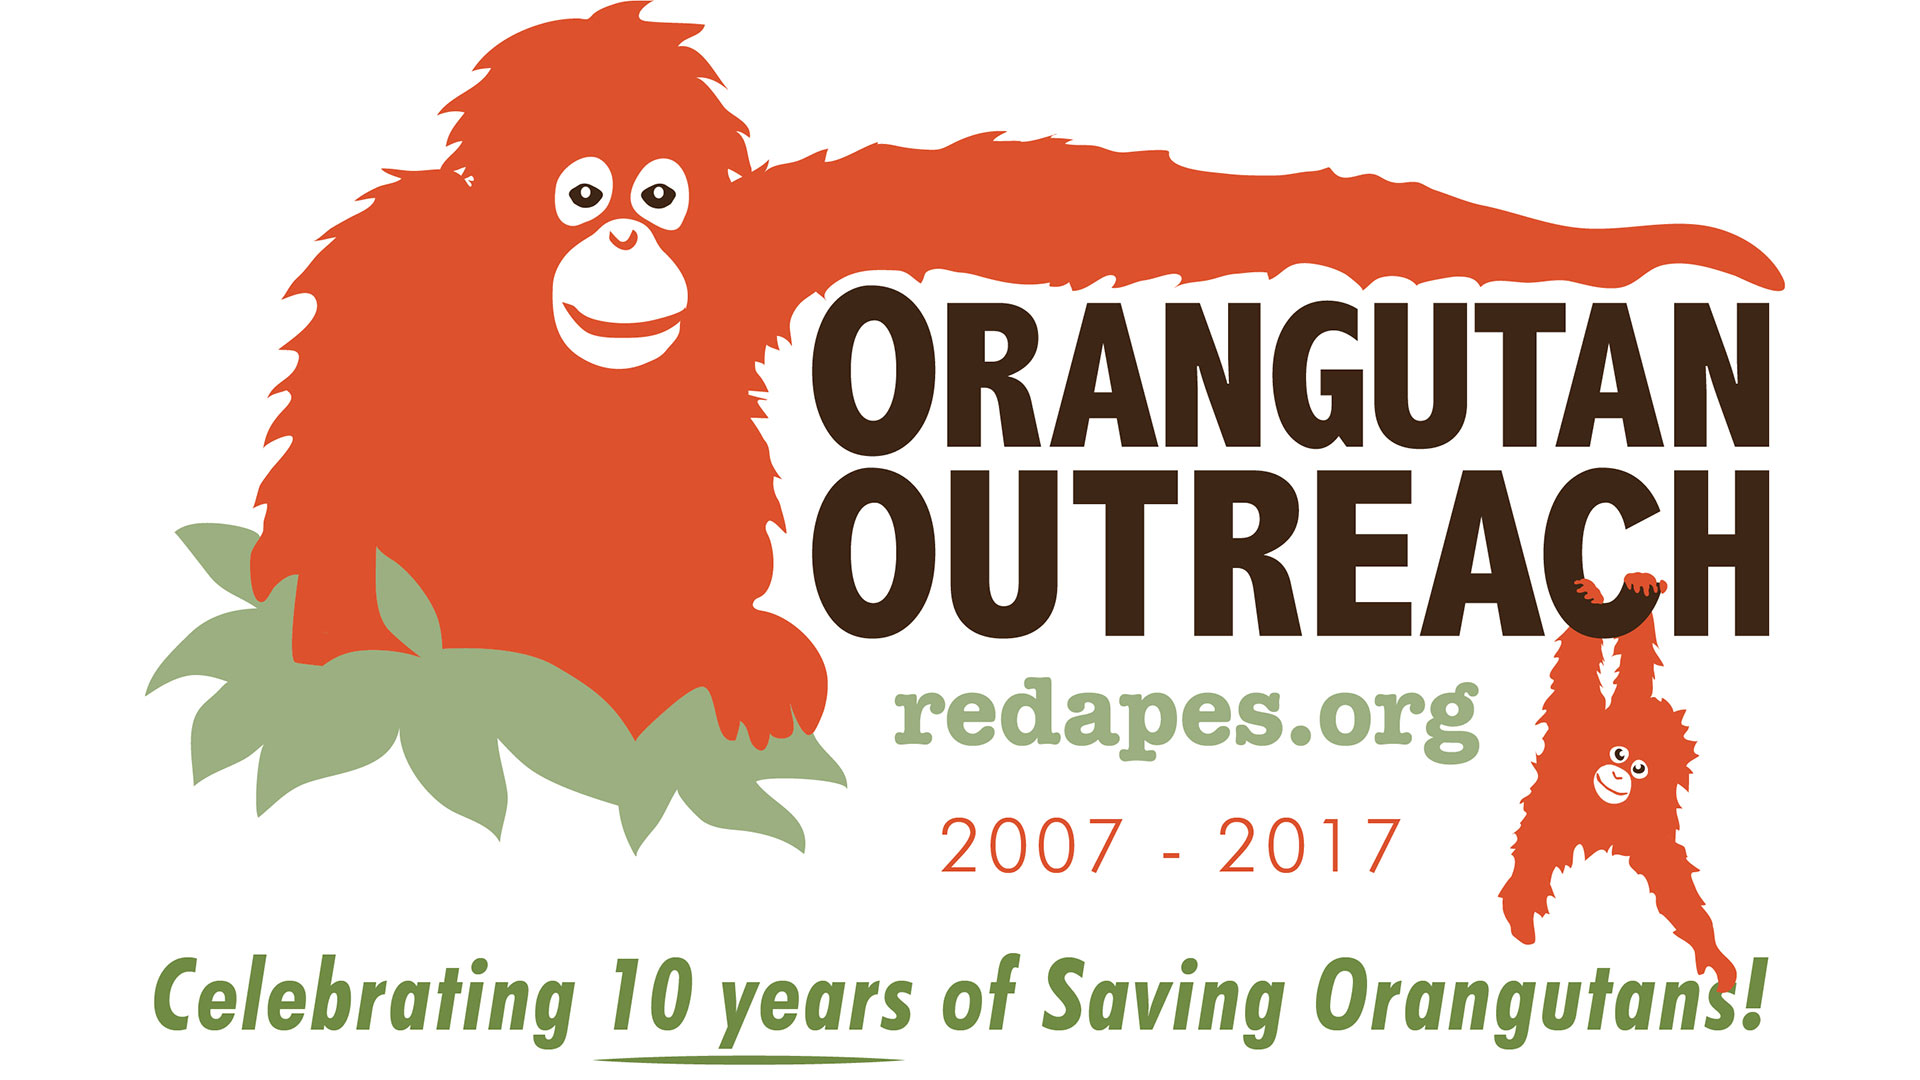 Orangutan Outreach - Celebrating 10 years of Saving Orangutans!